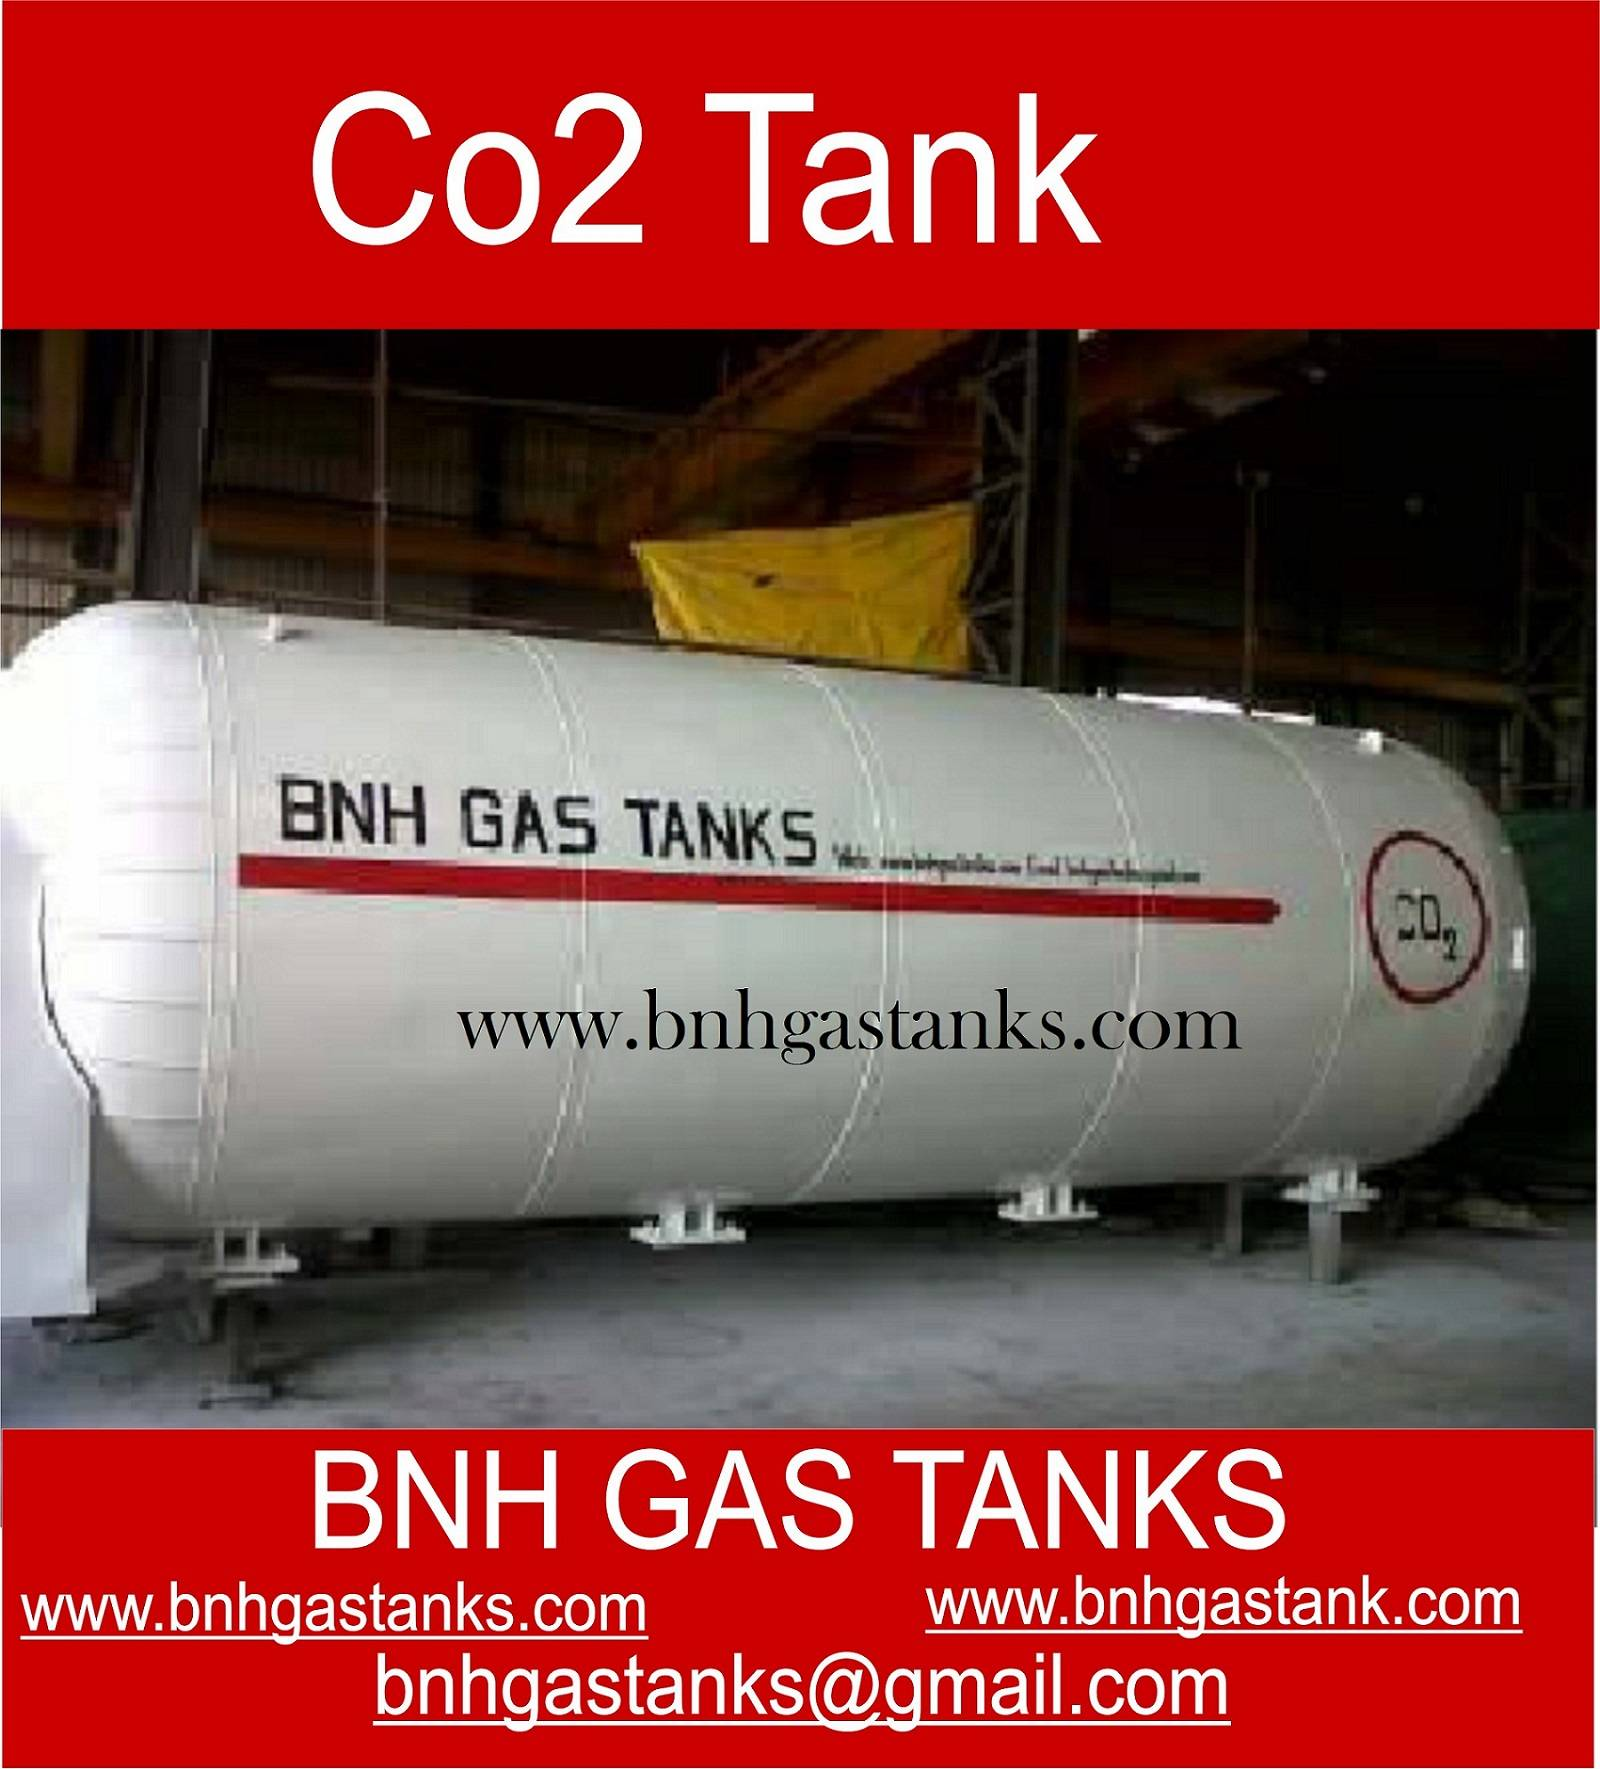 CO2 Tank